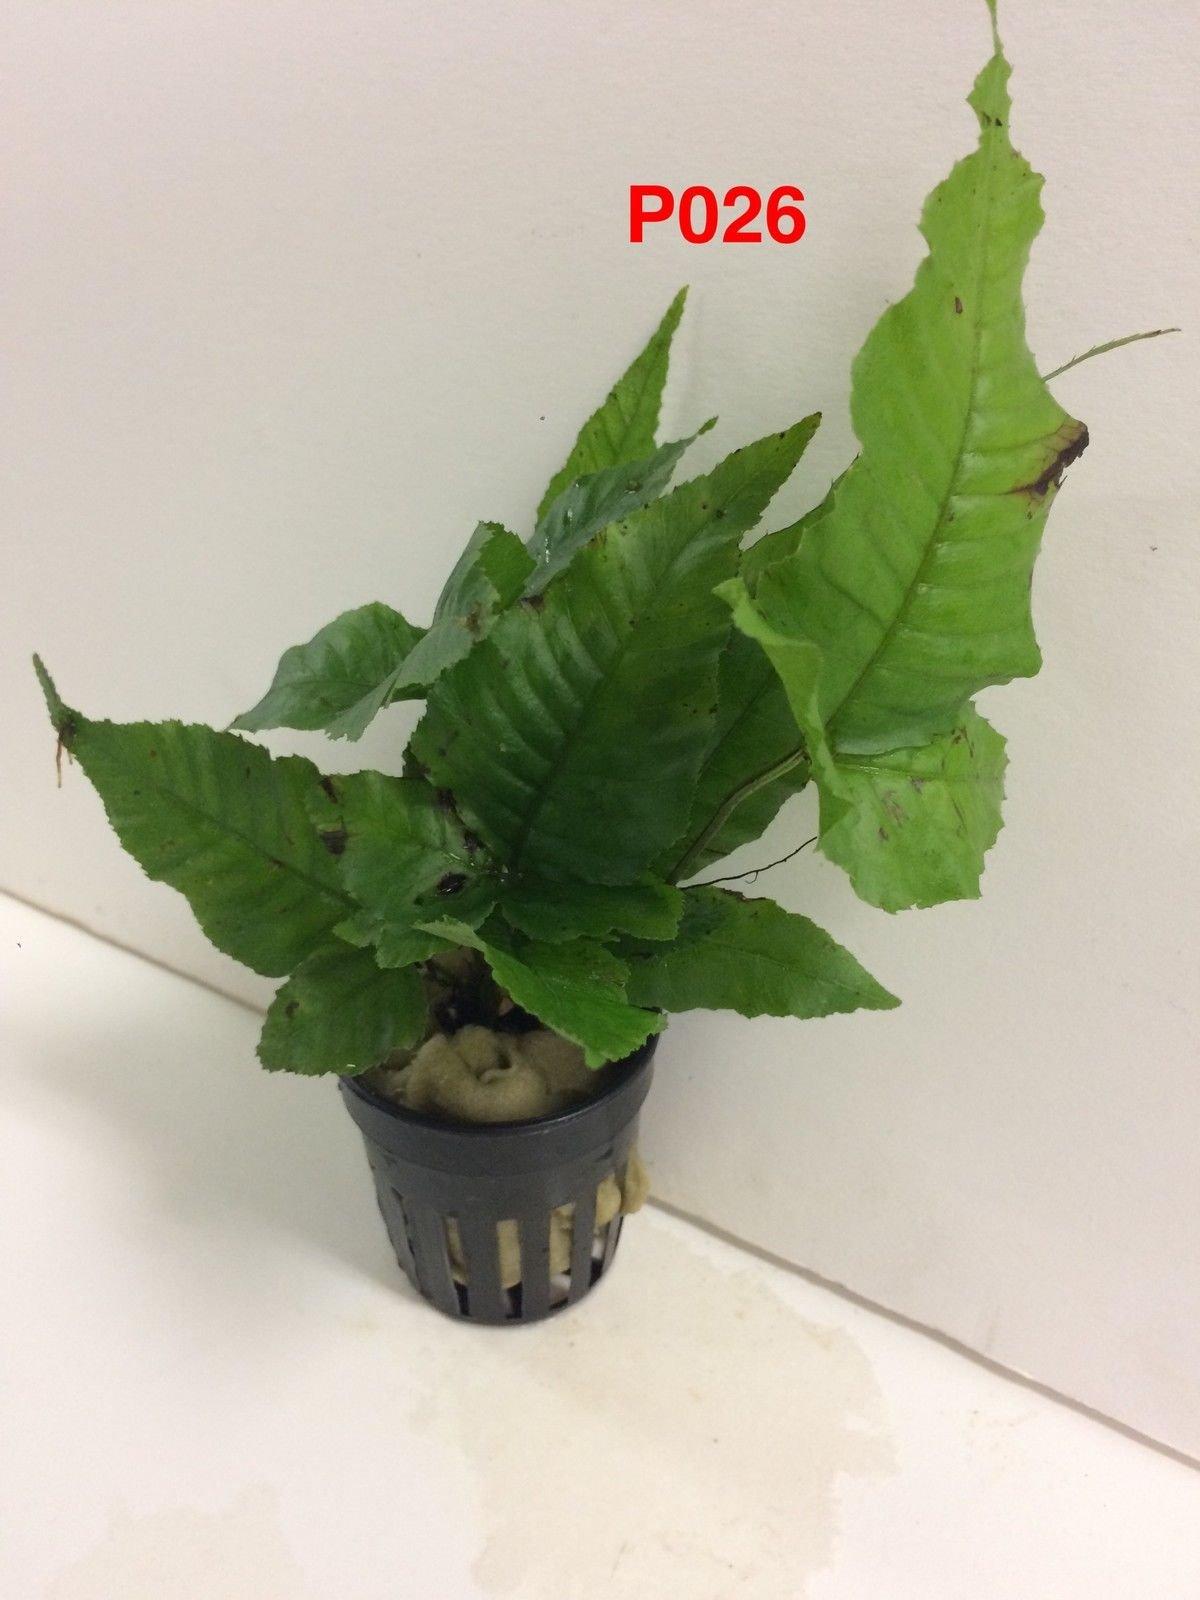 Exotic Live Aquatic Plant Bolbitis asiatica / heteroclita Potted P026